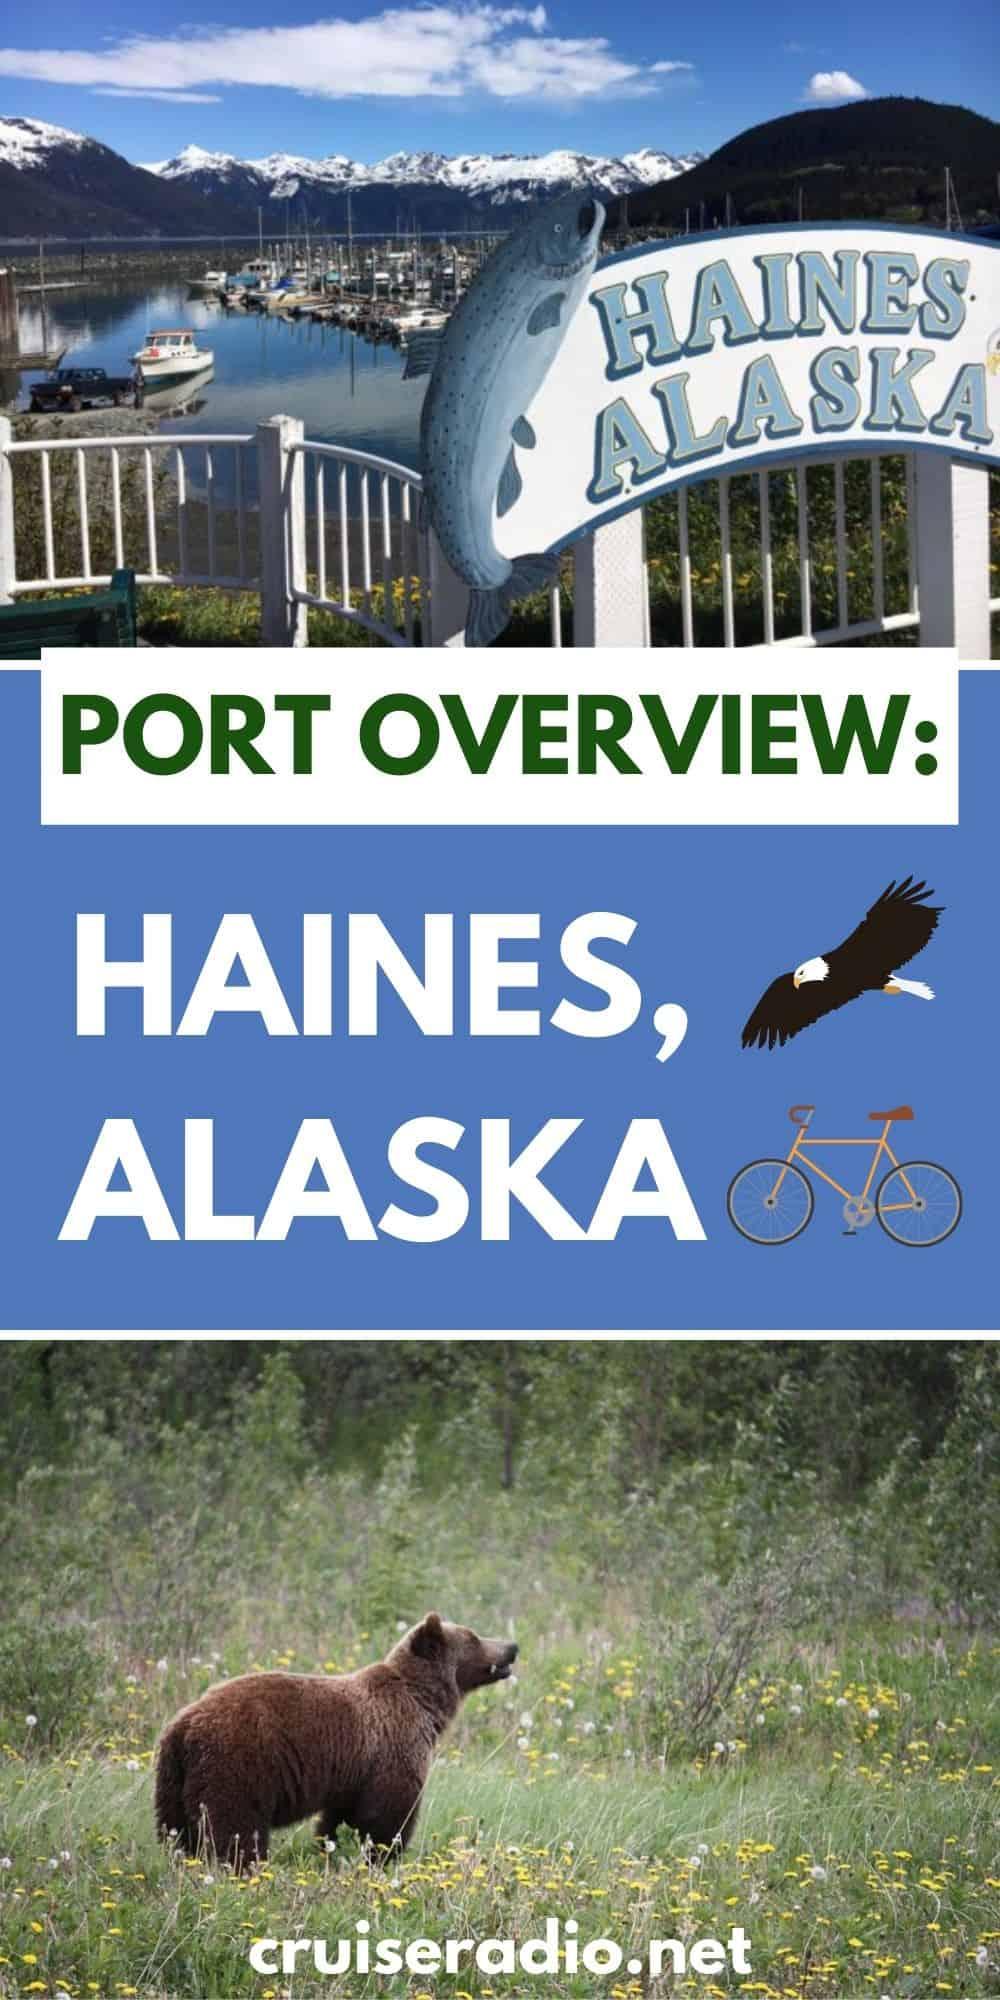 port overview haines alaska #alaska #cruise alaska cruise tips #travel #cruising